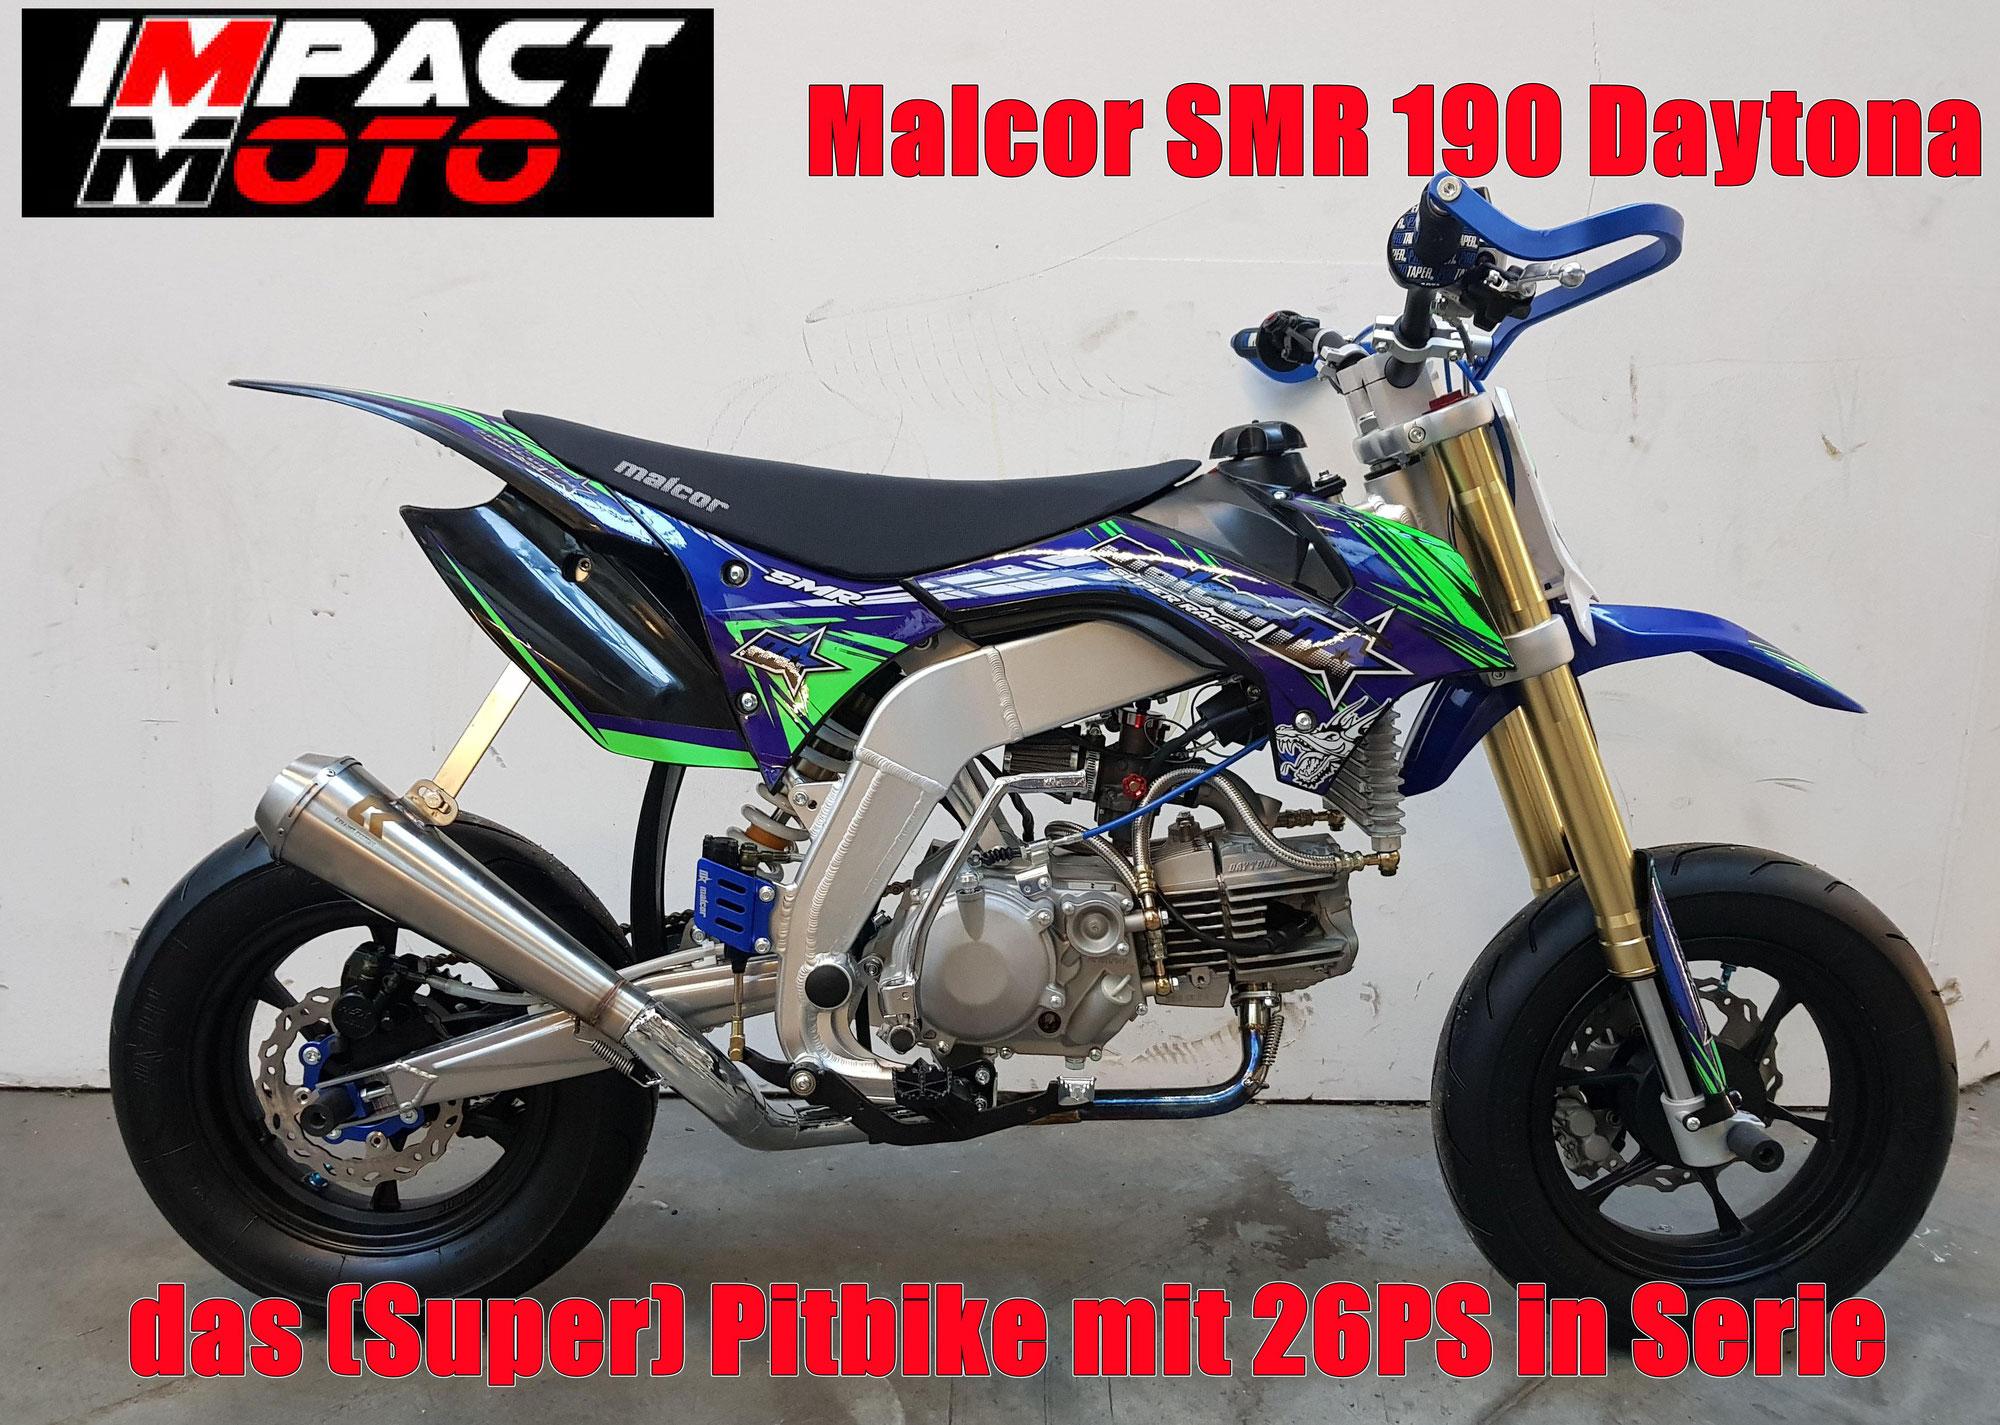 Pitbike mit Daytona Motor